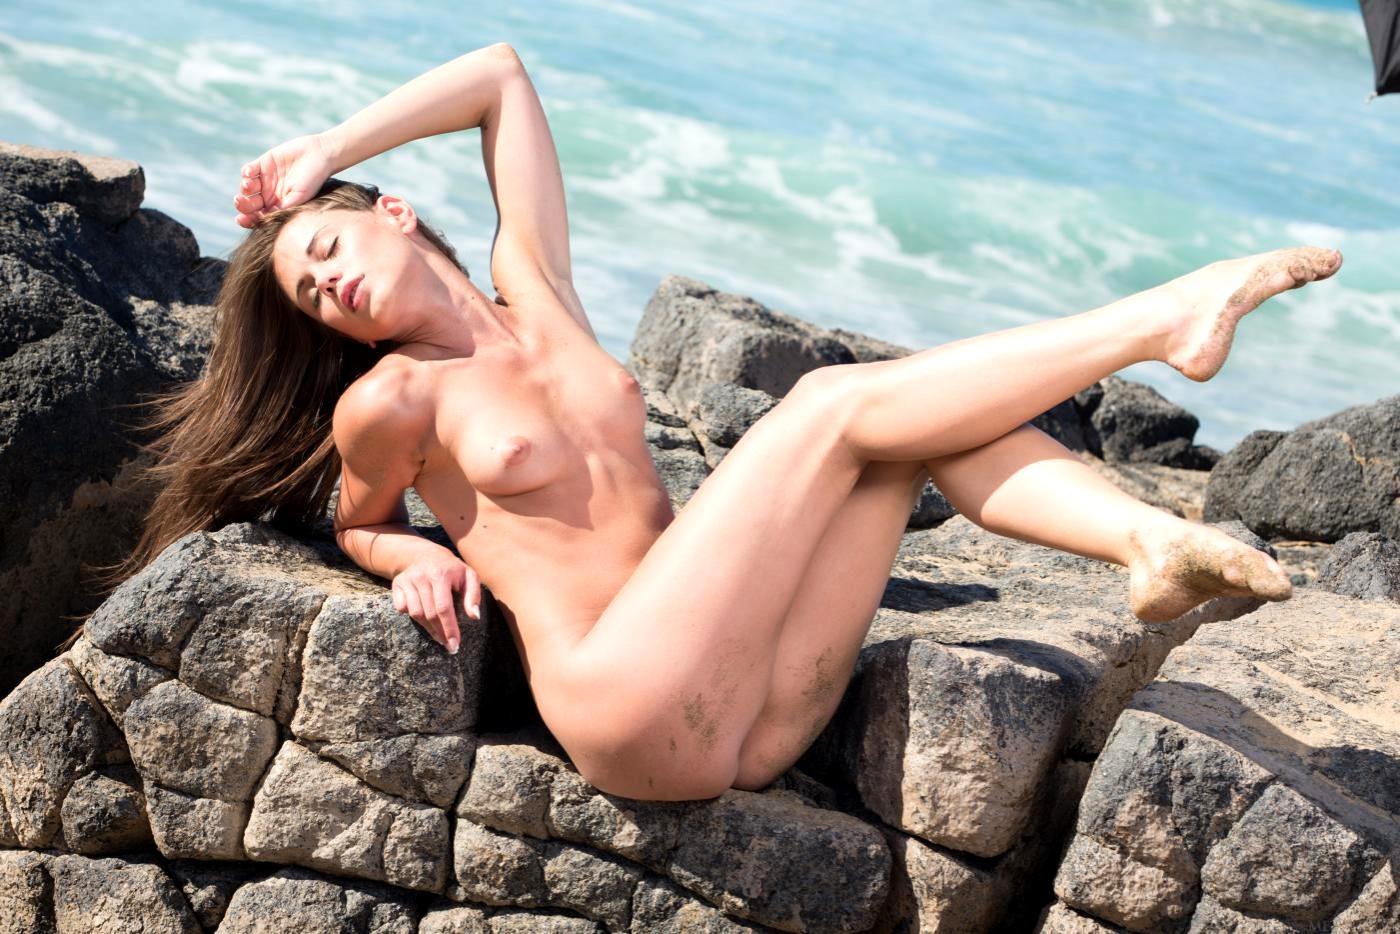 Free Teen Euro Teen Erotica Thumbs Tits Free Photos